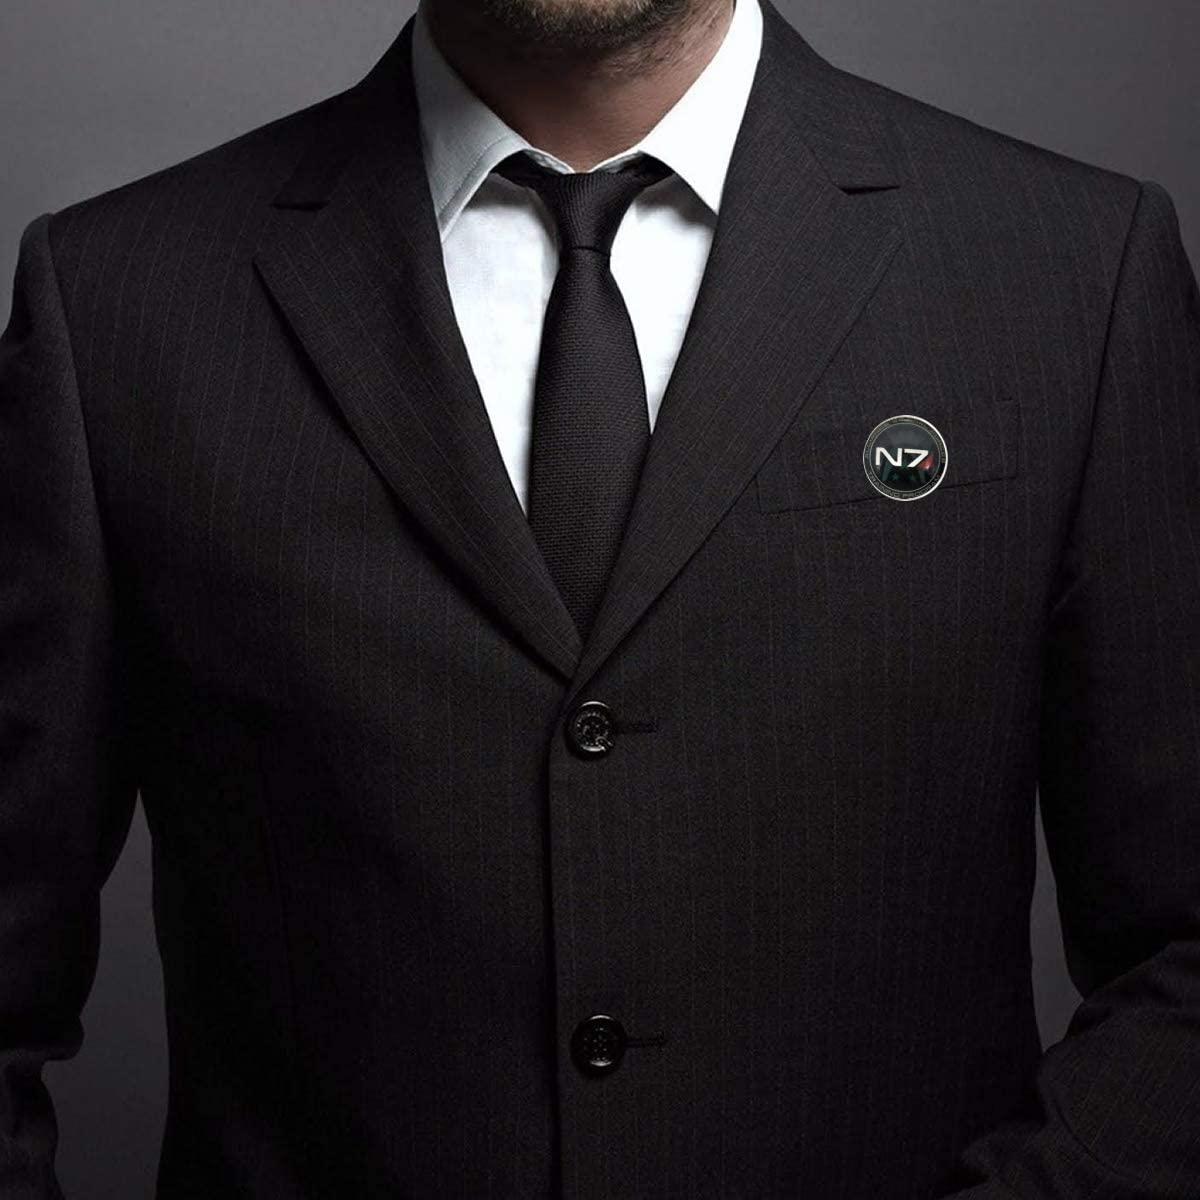 Pinback Buttons Badges Pins N7 Lapel Pin Brooch Clip Trendy Accessory Jacket T-Shirt Bag Hat Shoe